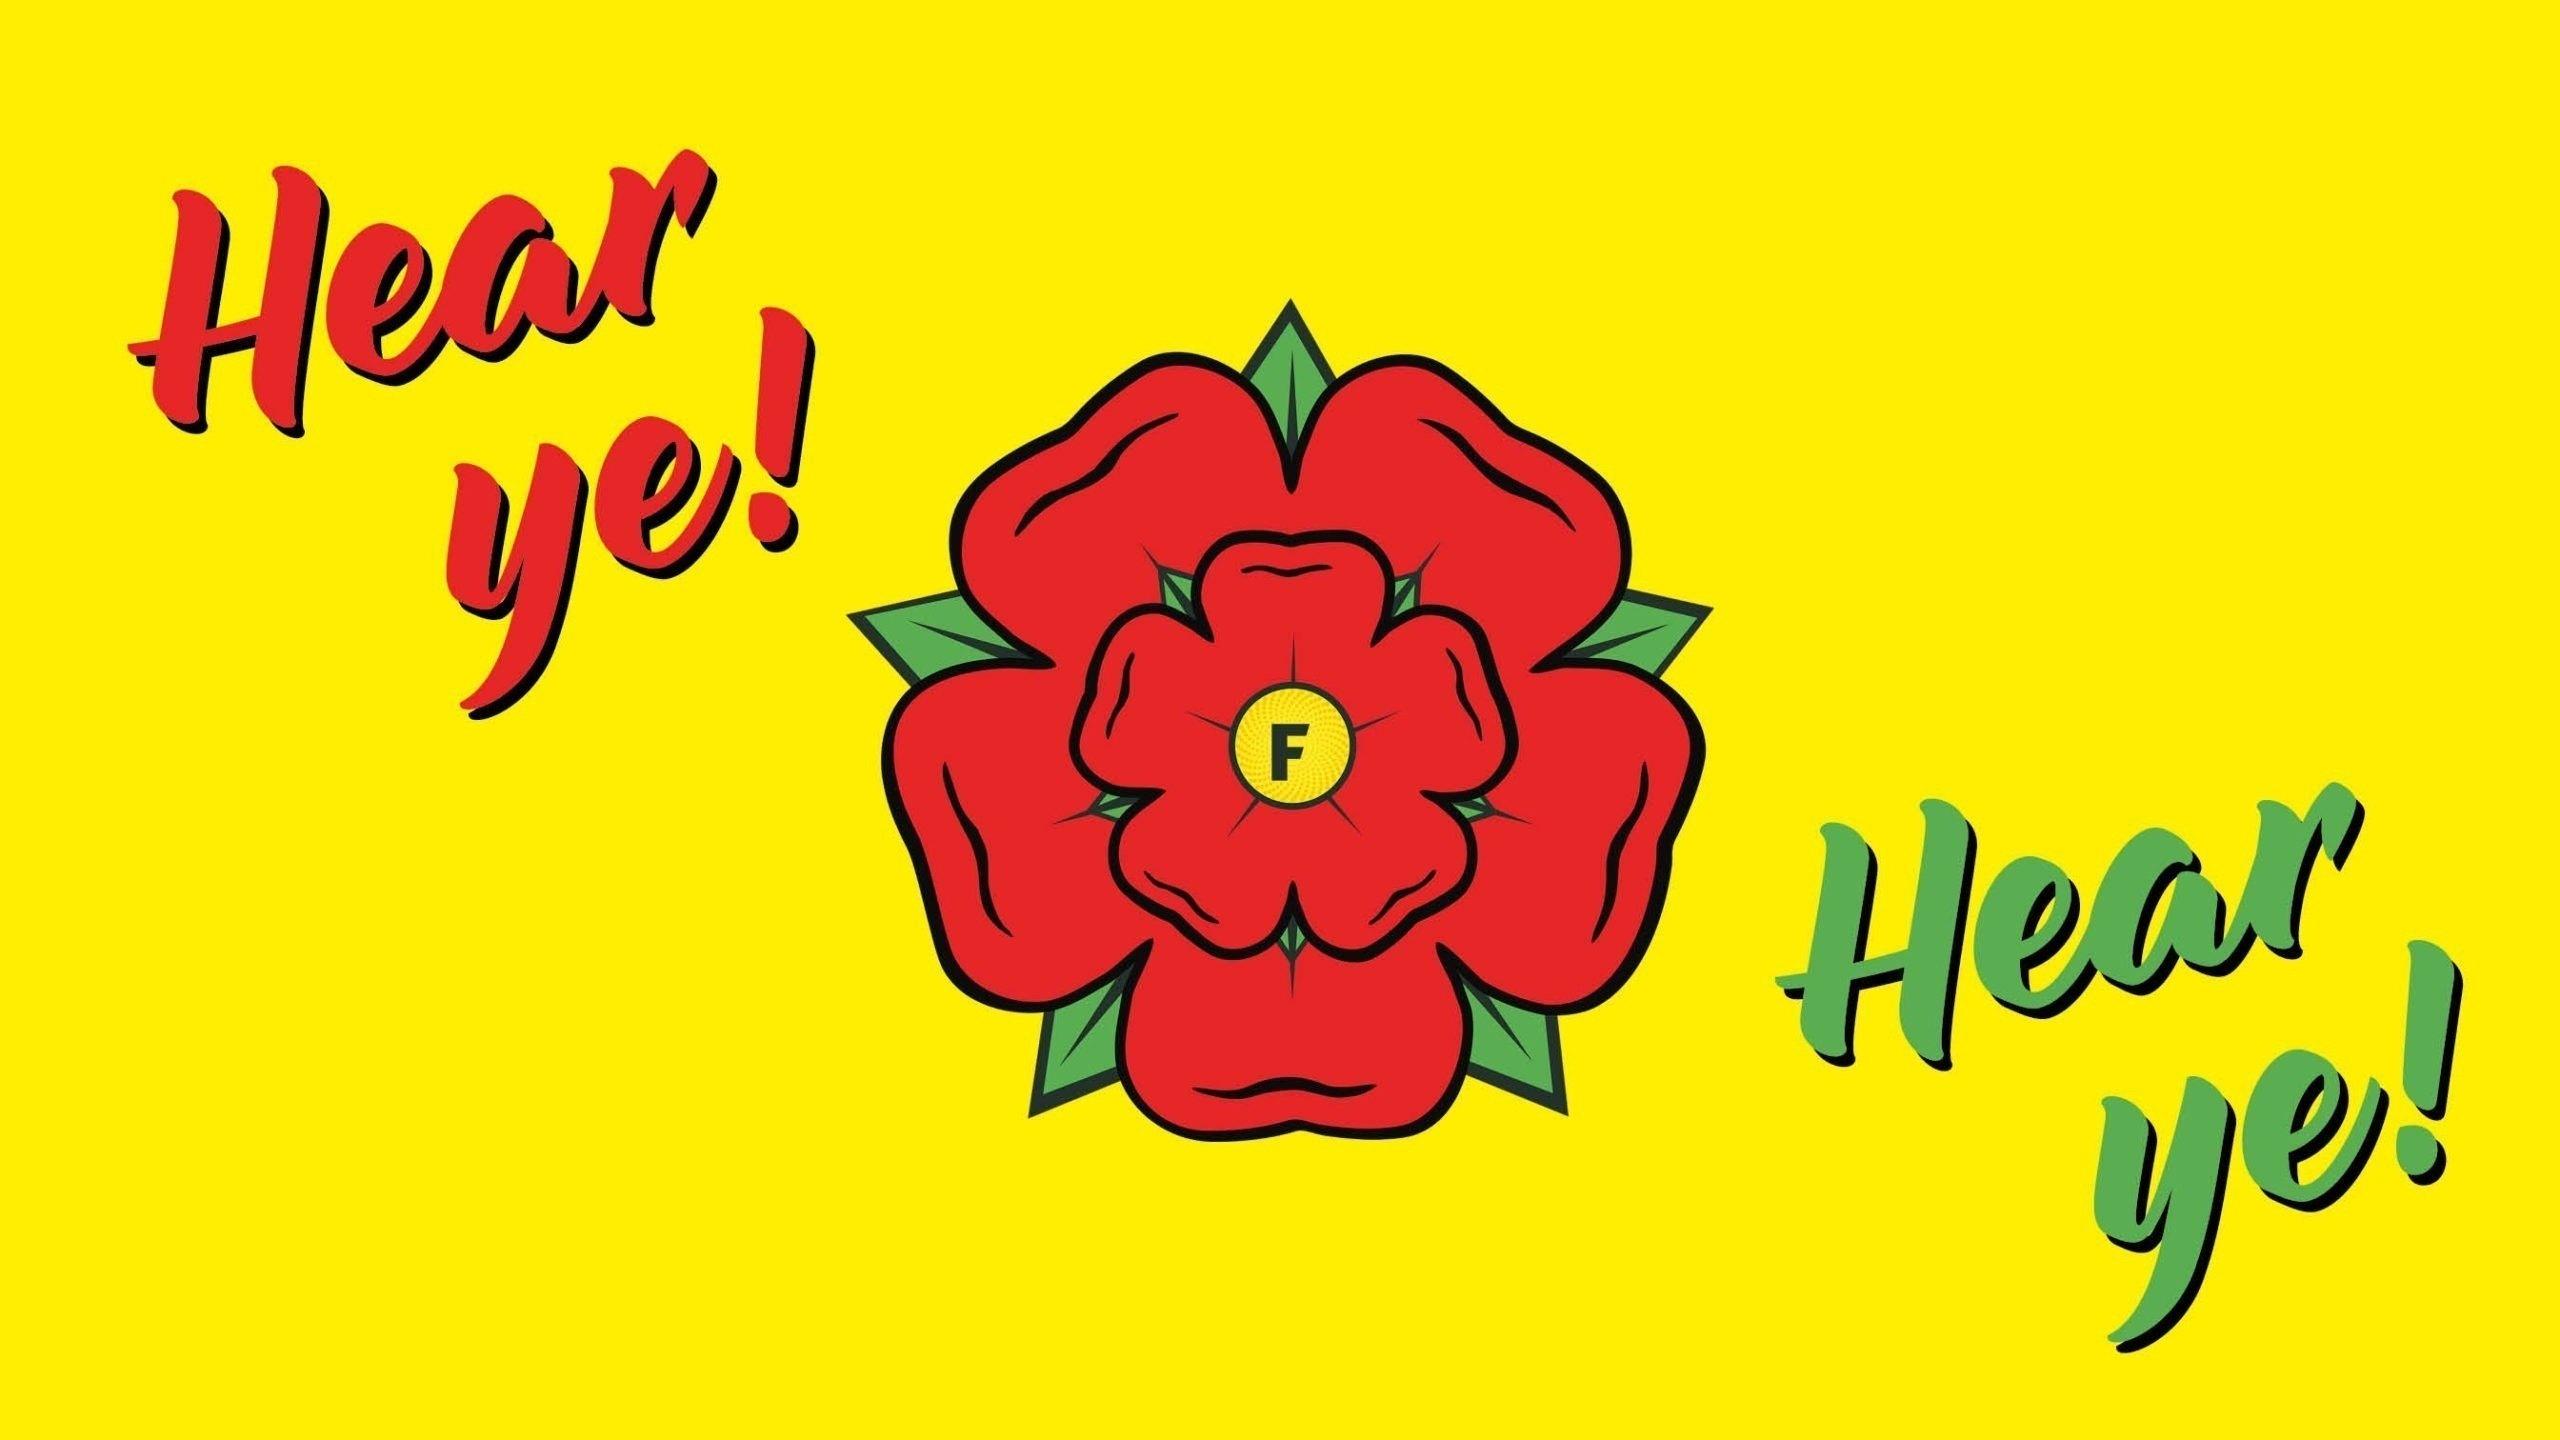 Lancashire Day graphic